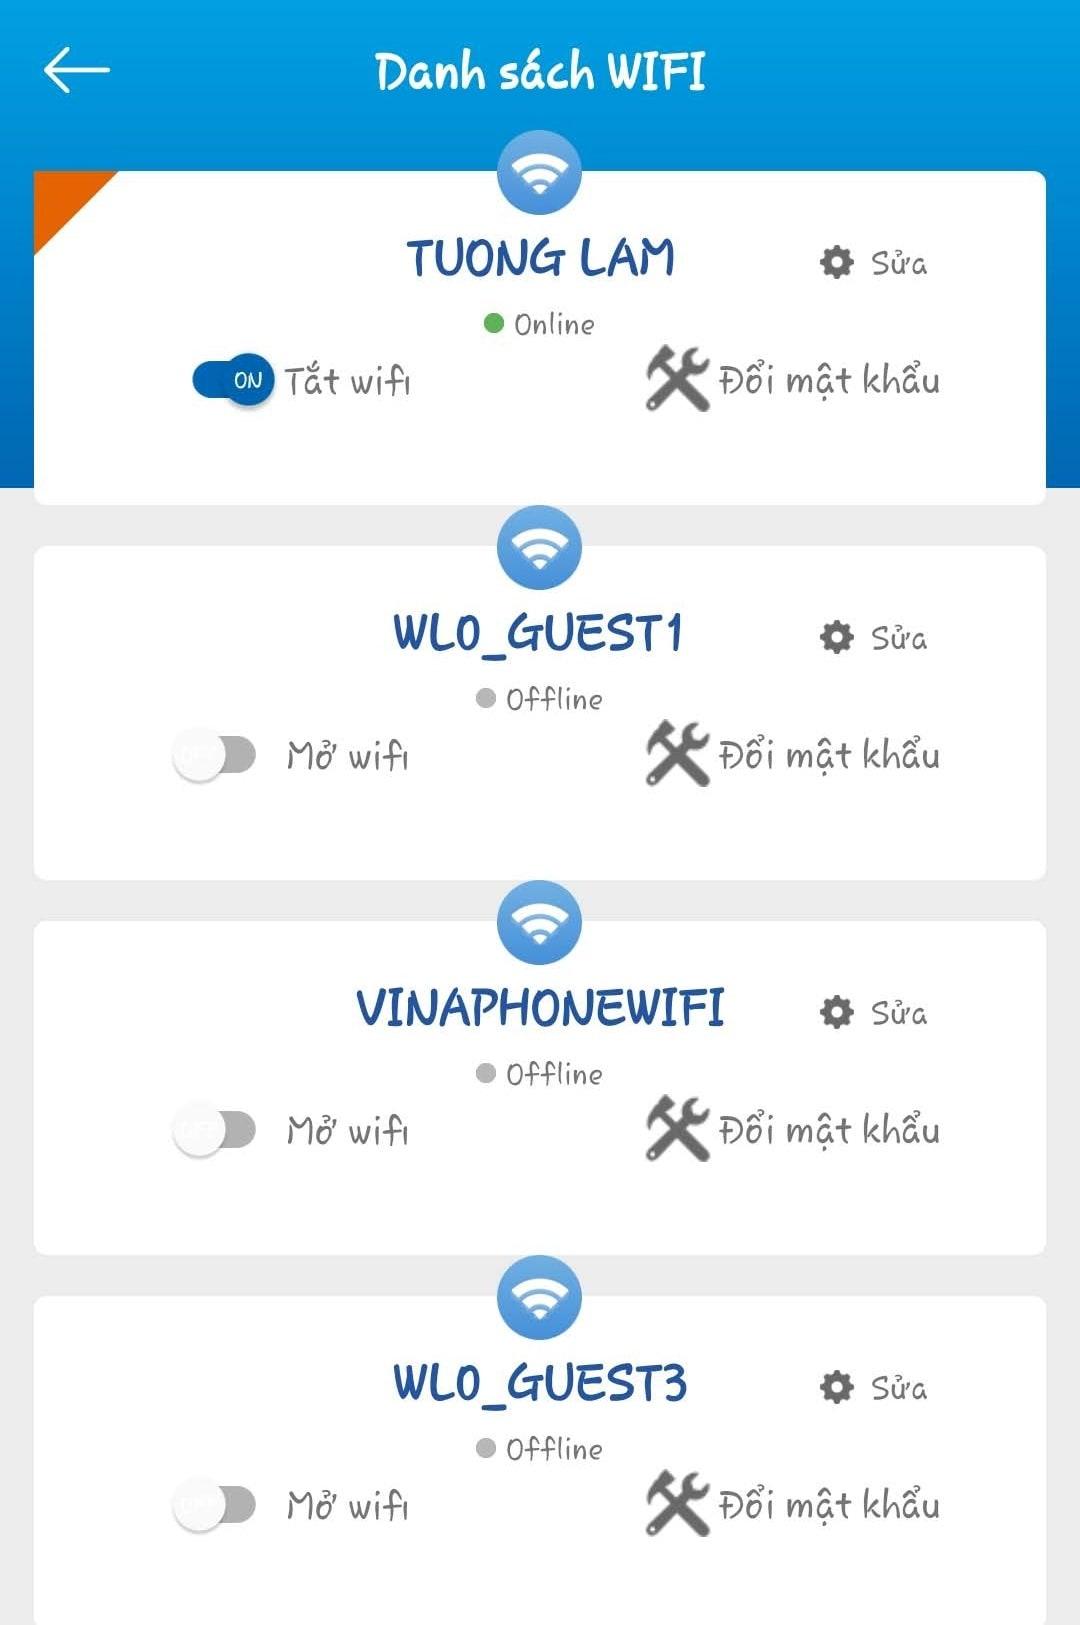 Danh sách wifi trên modem